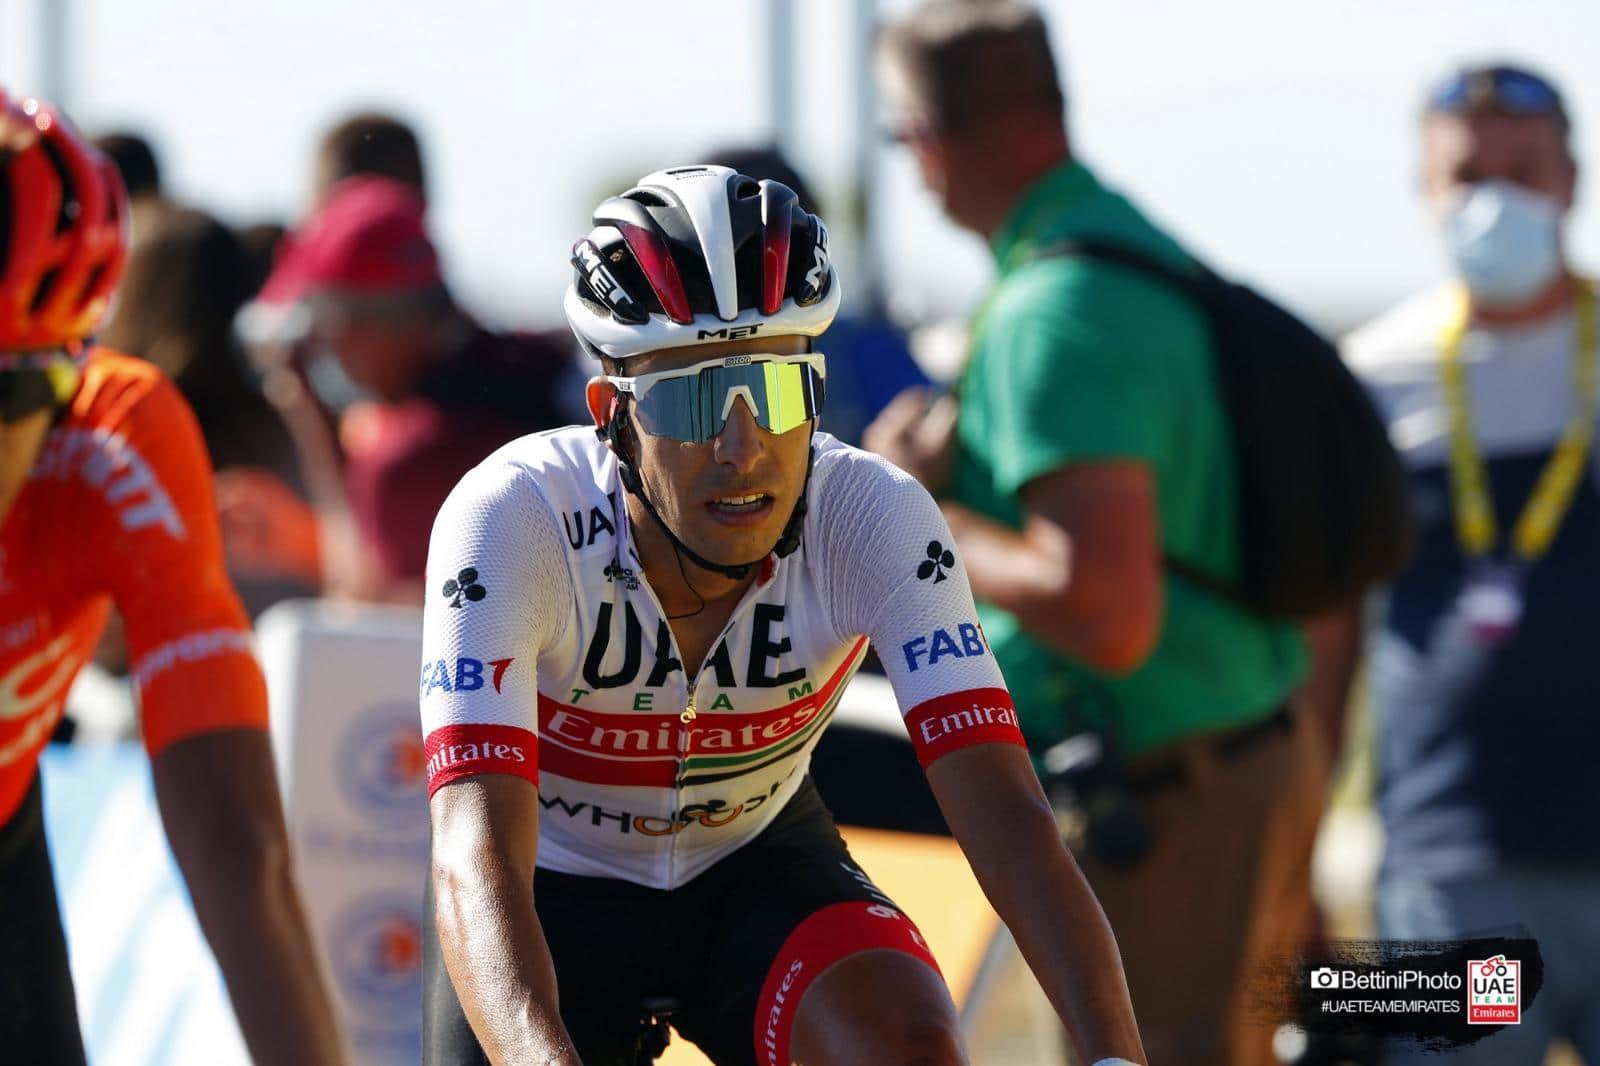 L'Italien Fabio Aru signe avec une équipe sud-africaine — Cyclisme